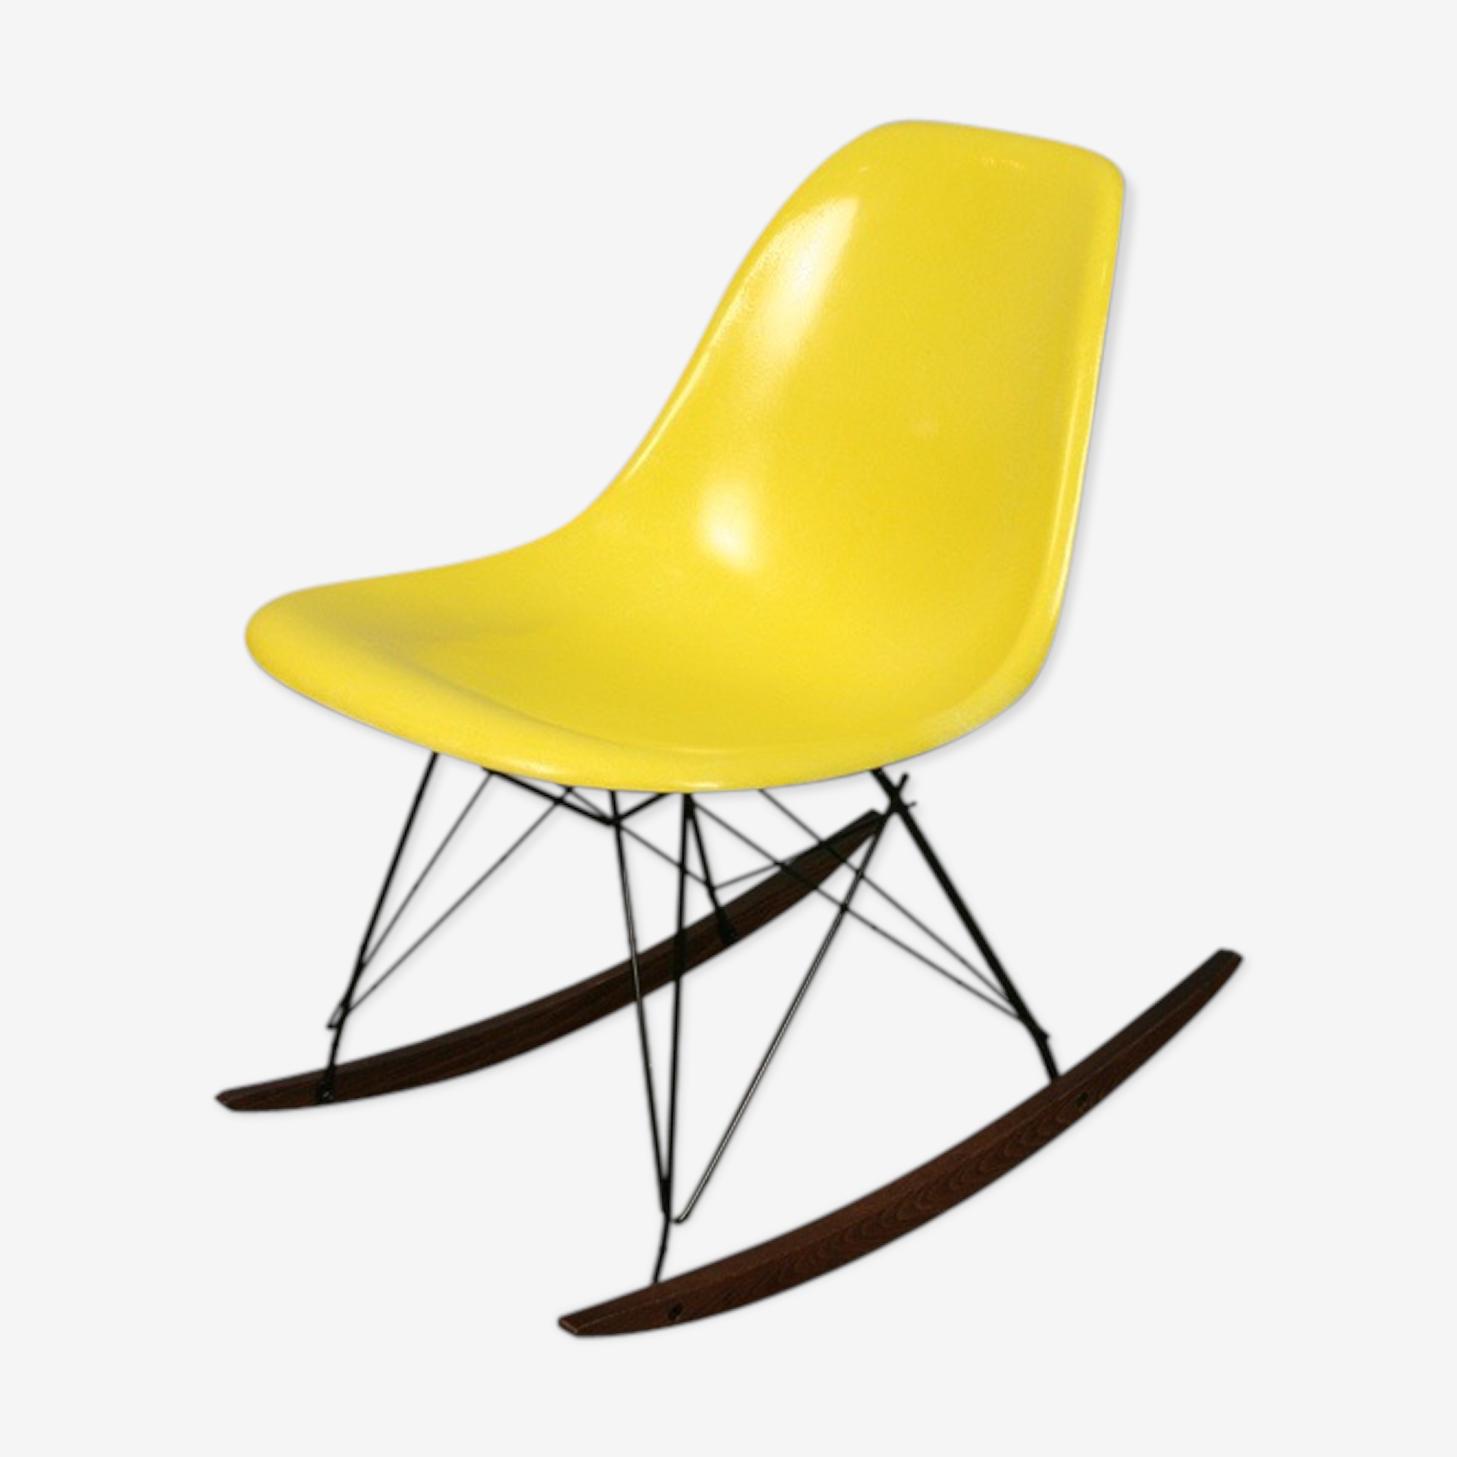 Chaise à bascule rocking chair jaune Eames Herman Miller